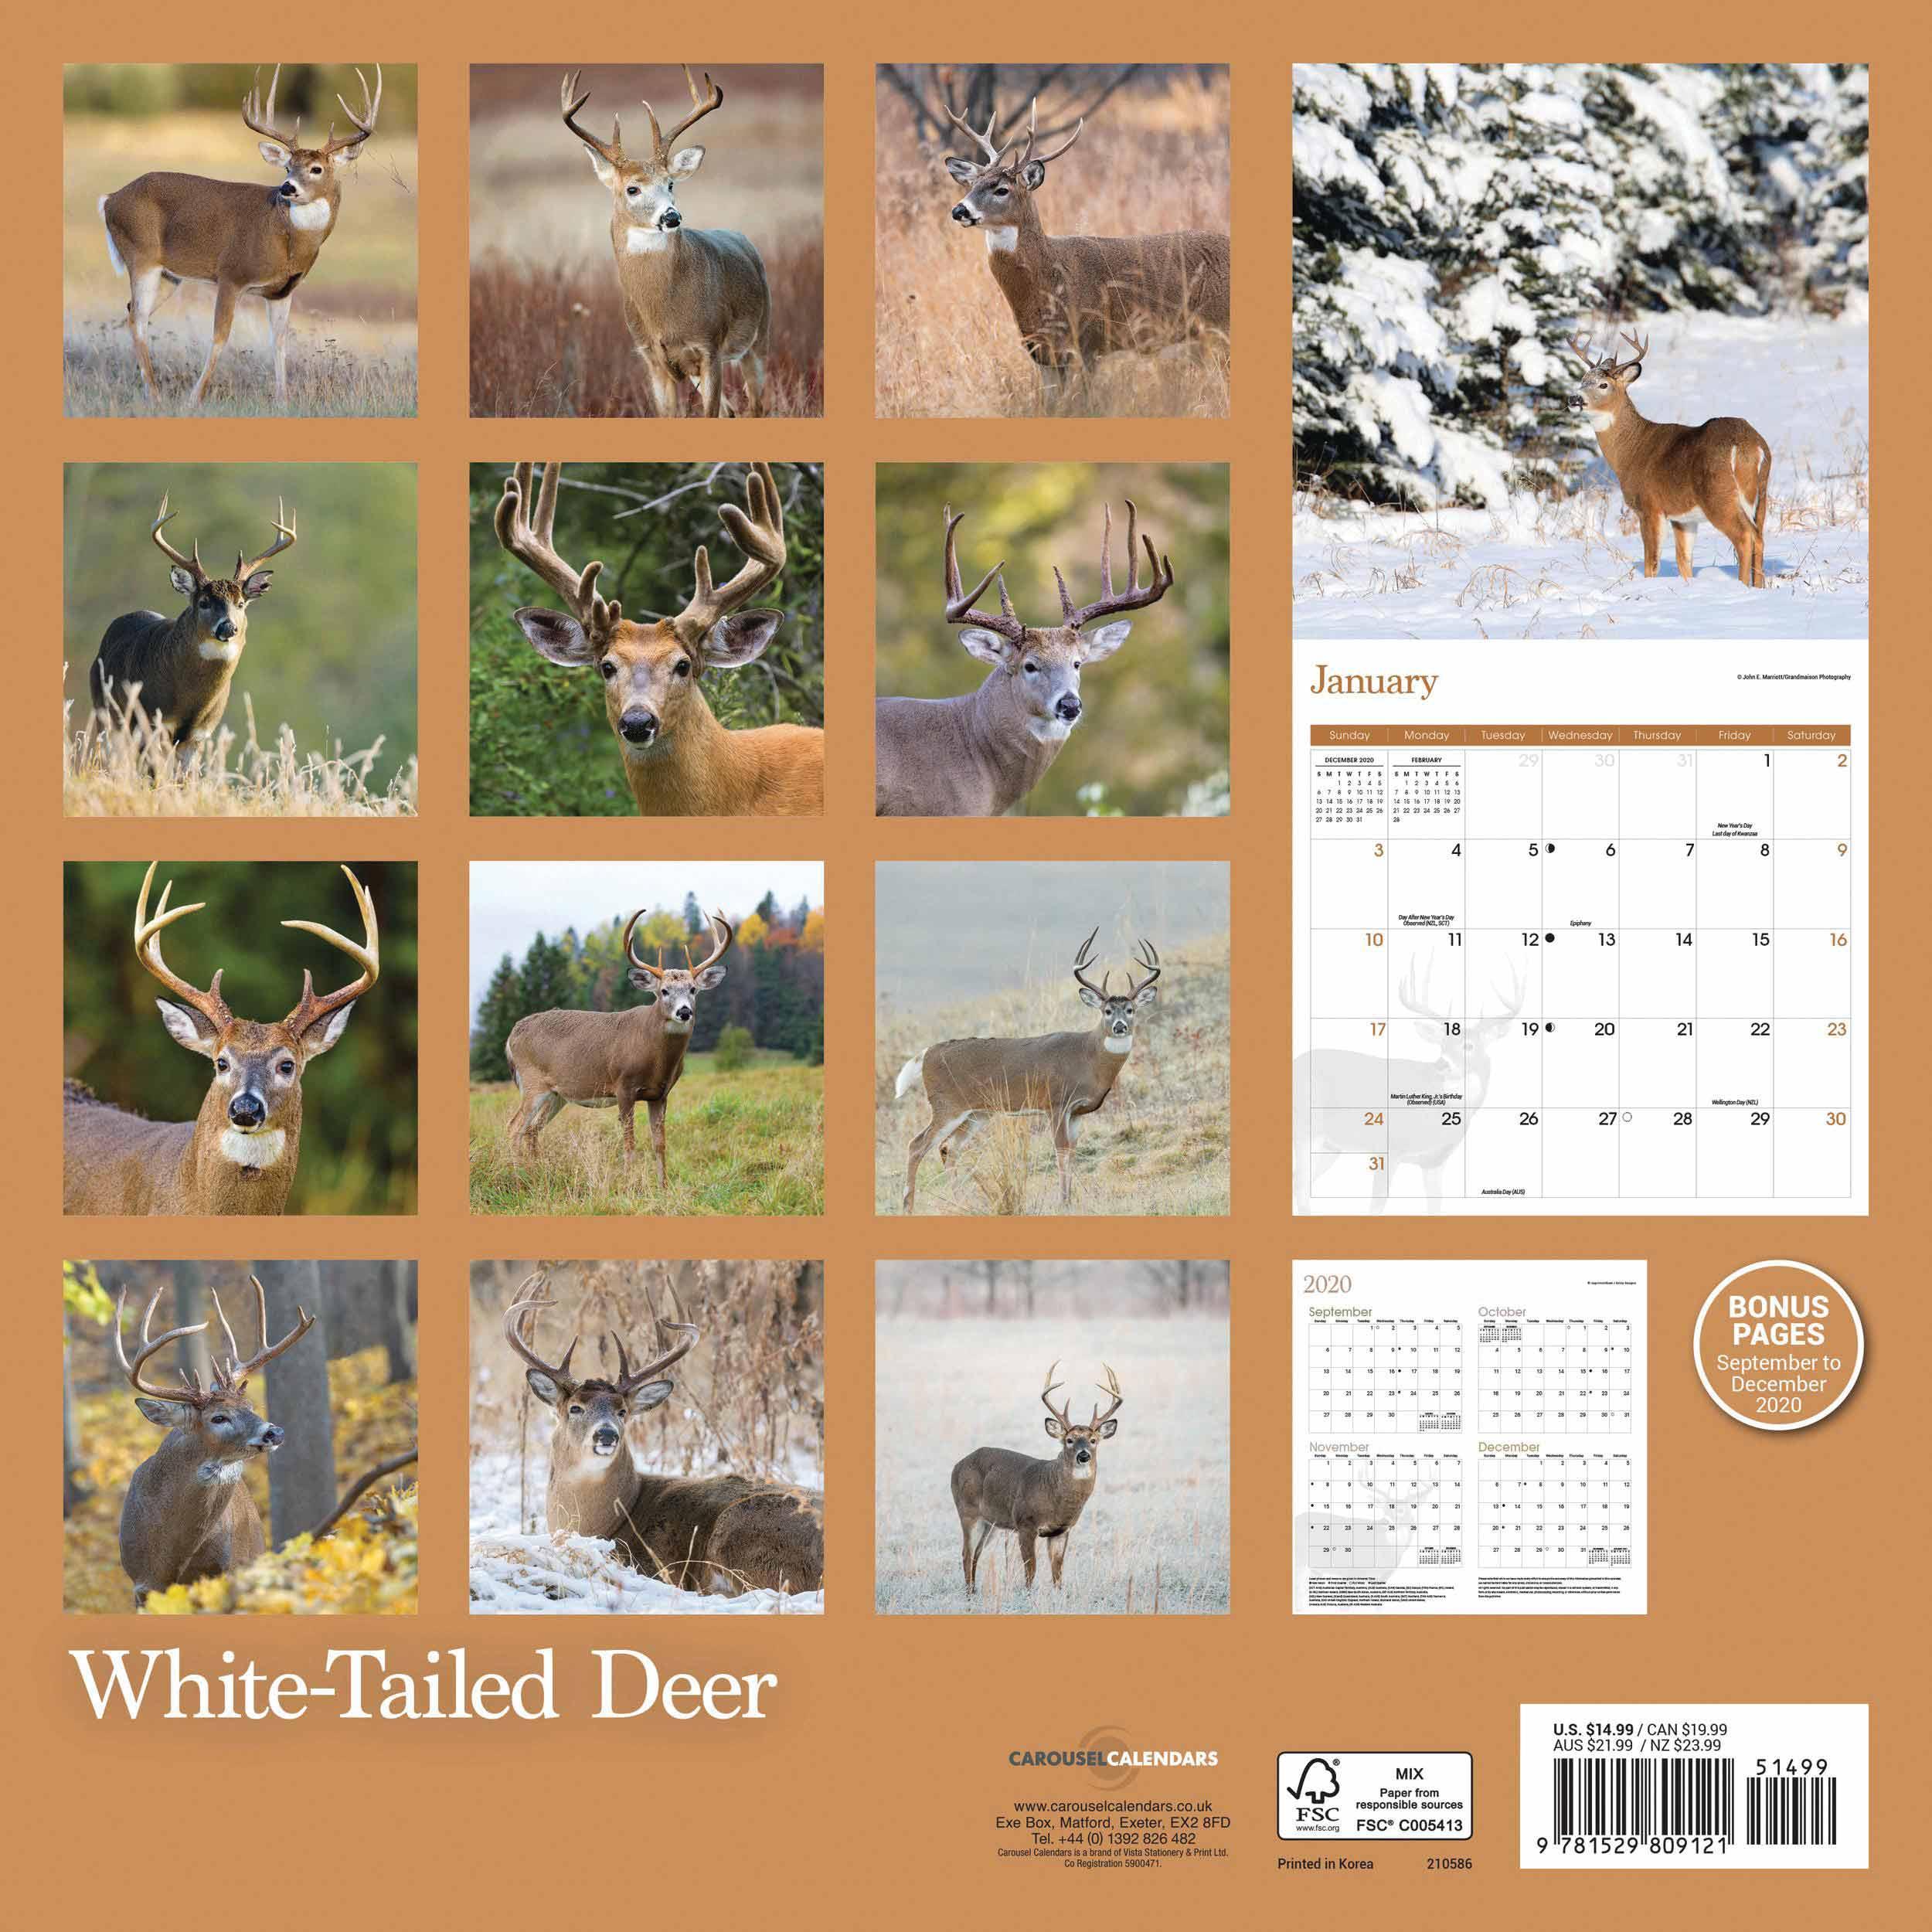 White-Tailed Deer Calendar 2021 At Calendar Club